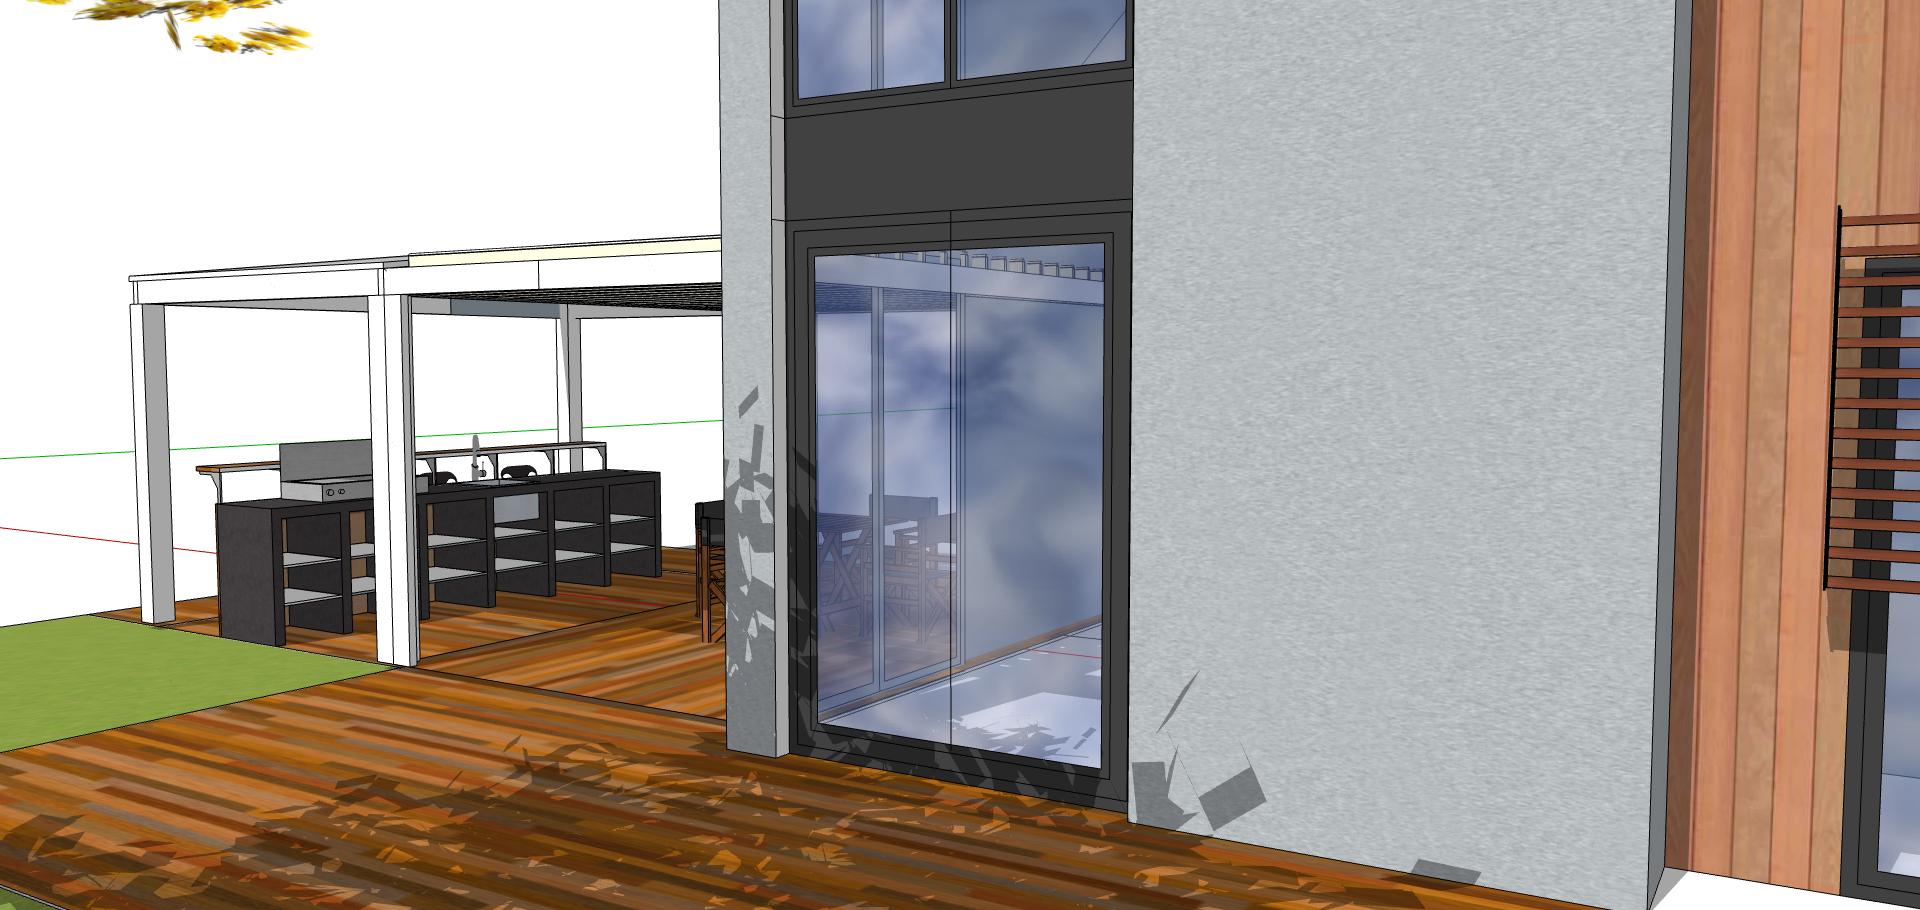 Renovation Terrasse Beton Idees Et Conseils